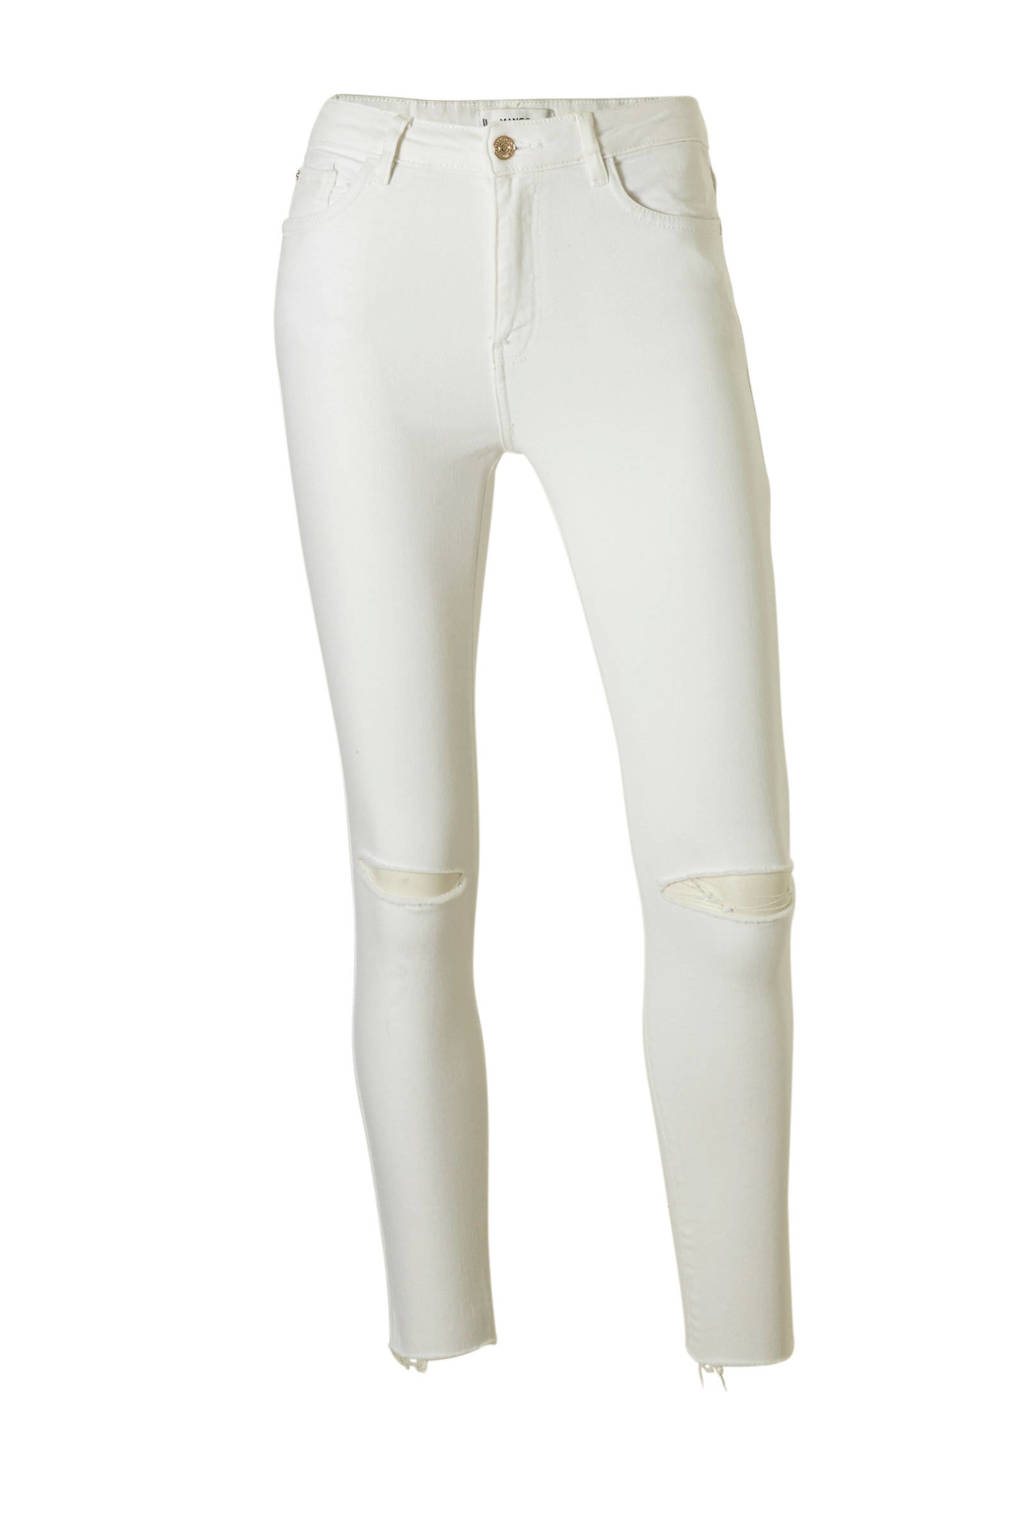 Mango cropped high waist skinny jeans, Wit